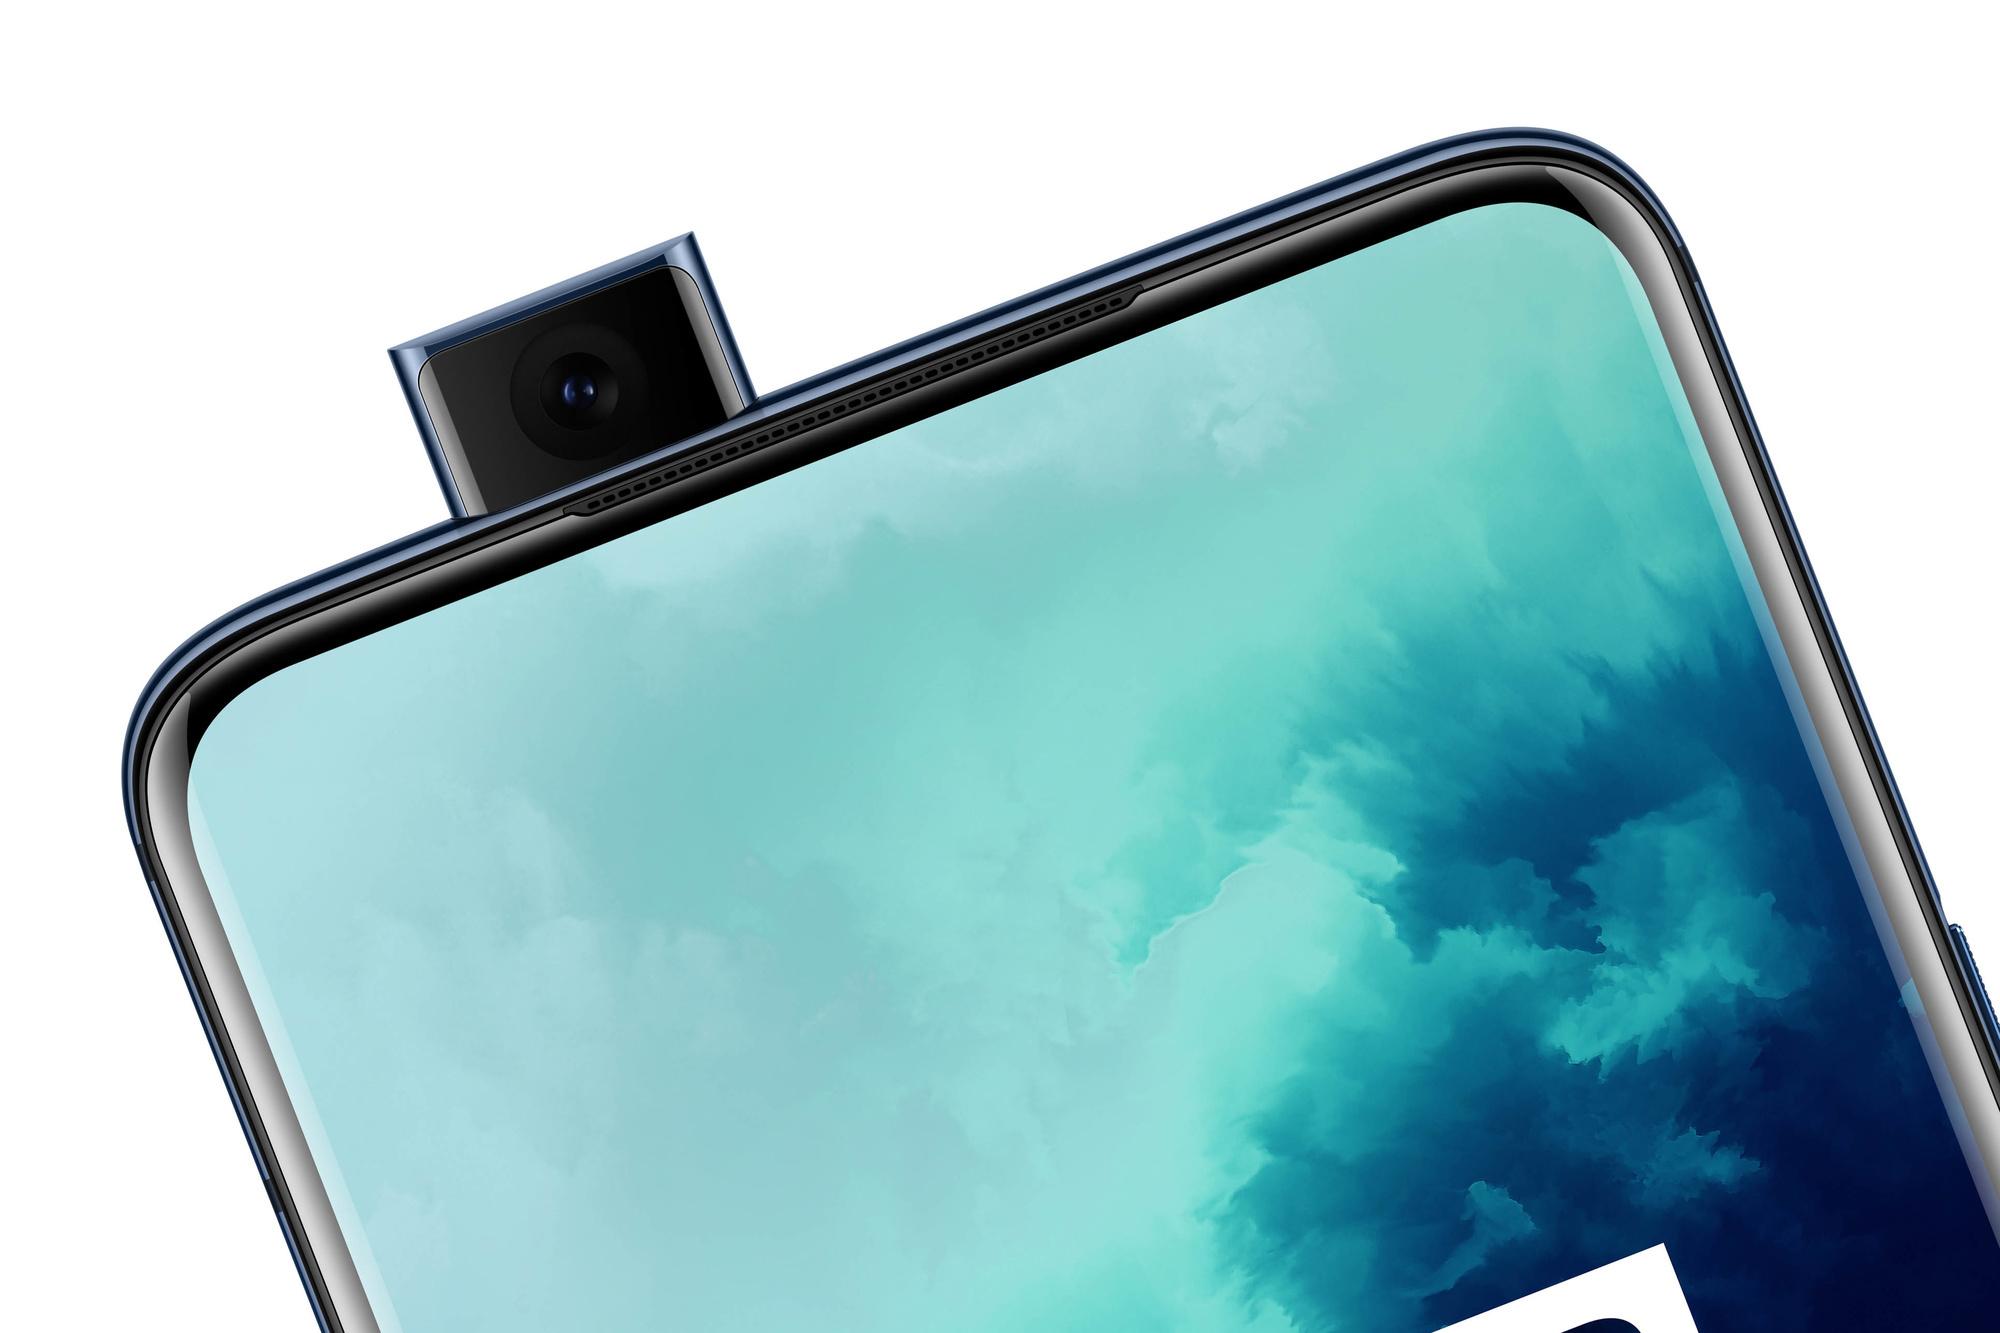 OnePlus 7T Pro, OnePlus